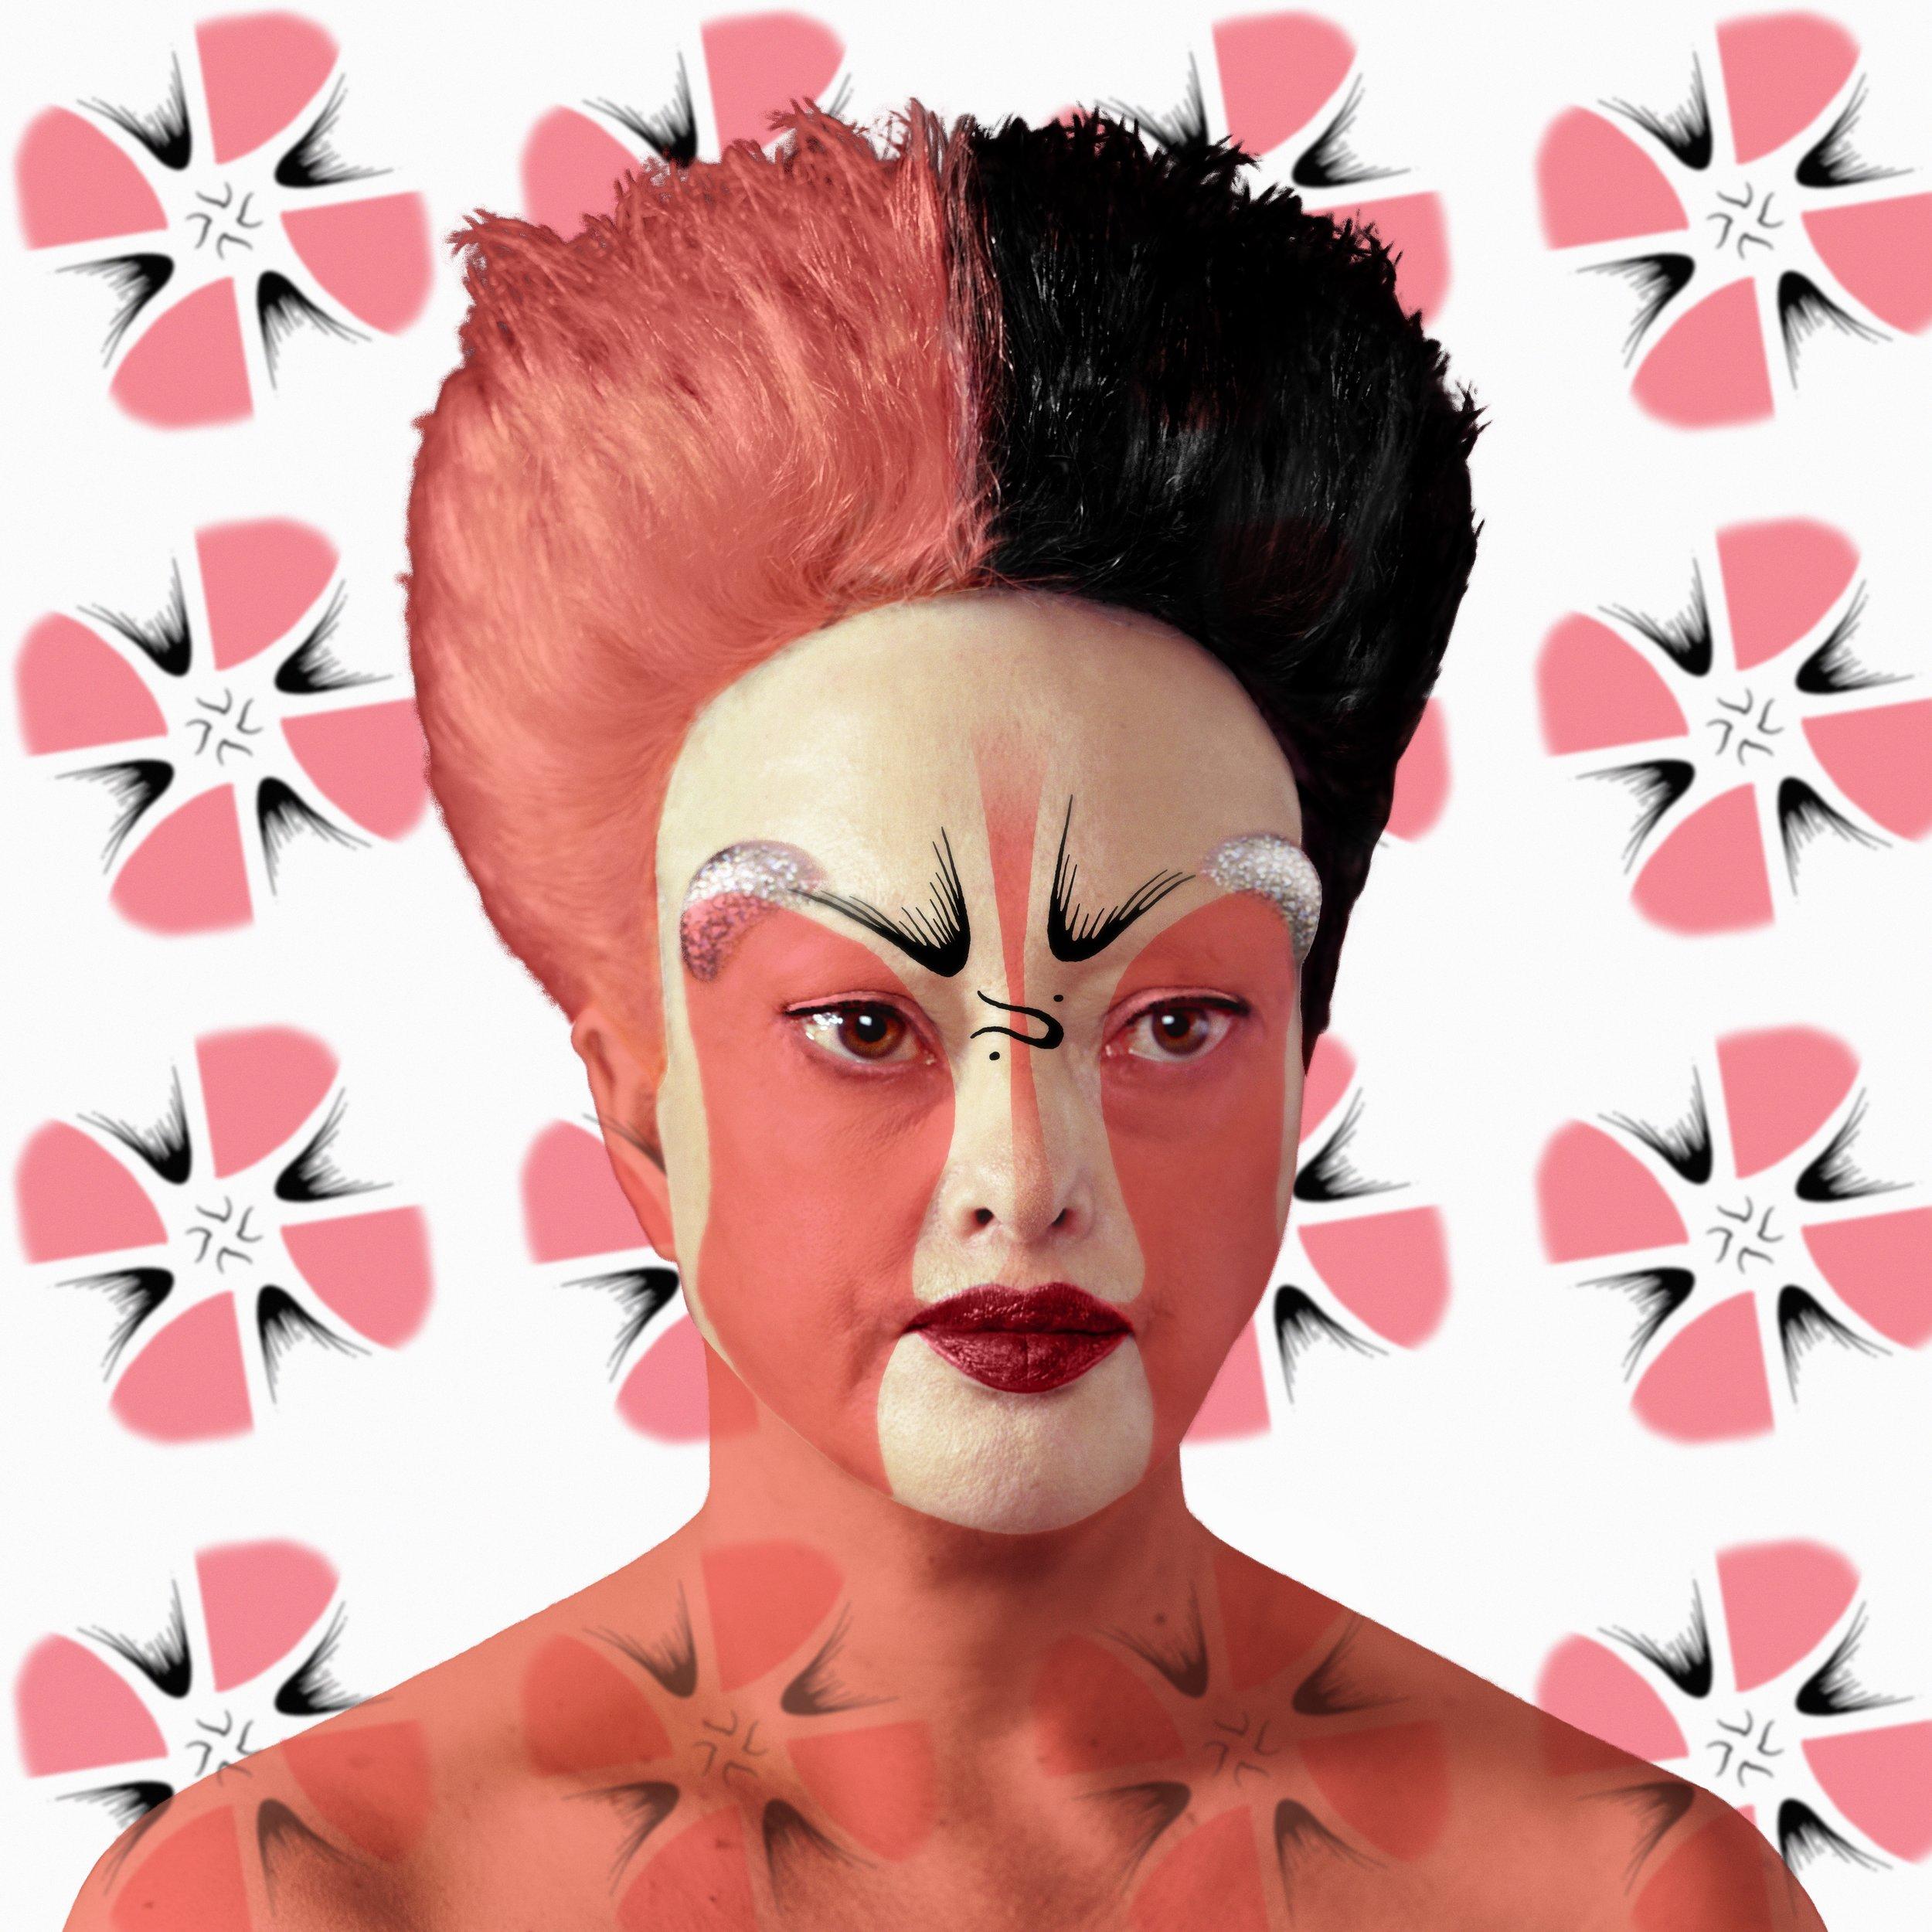 Beijing opera mask self-hybridation, facing design n°5 - 2014 © Orlan, Courtesy of Michel Rein gallery